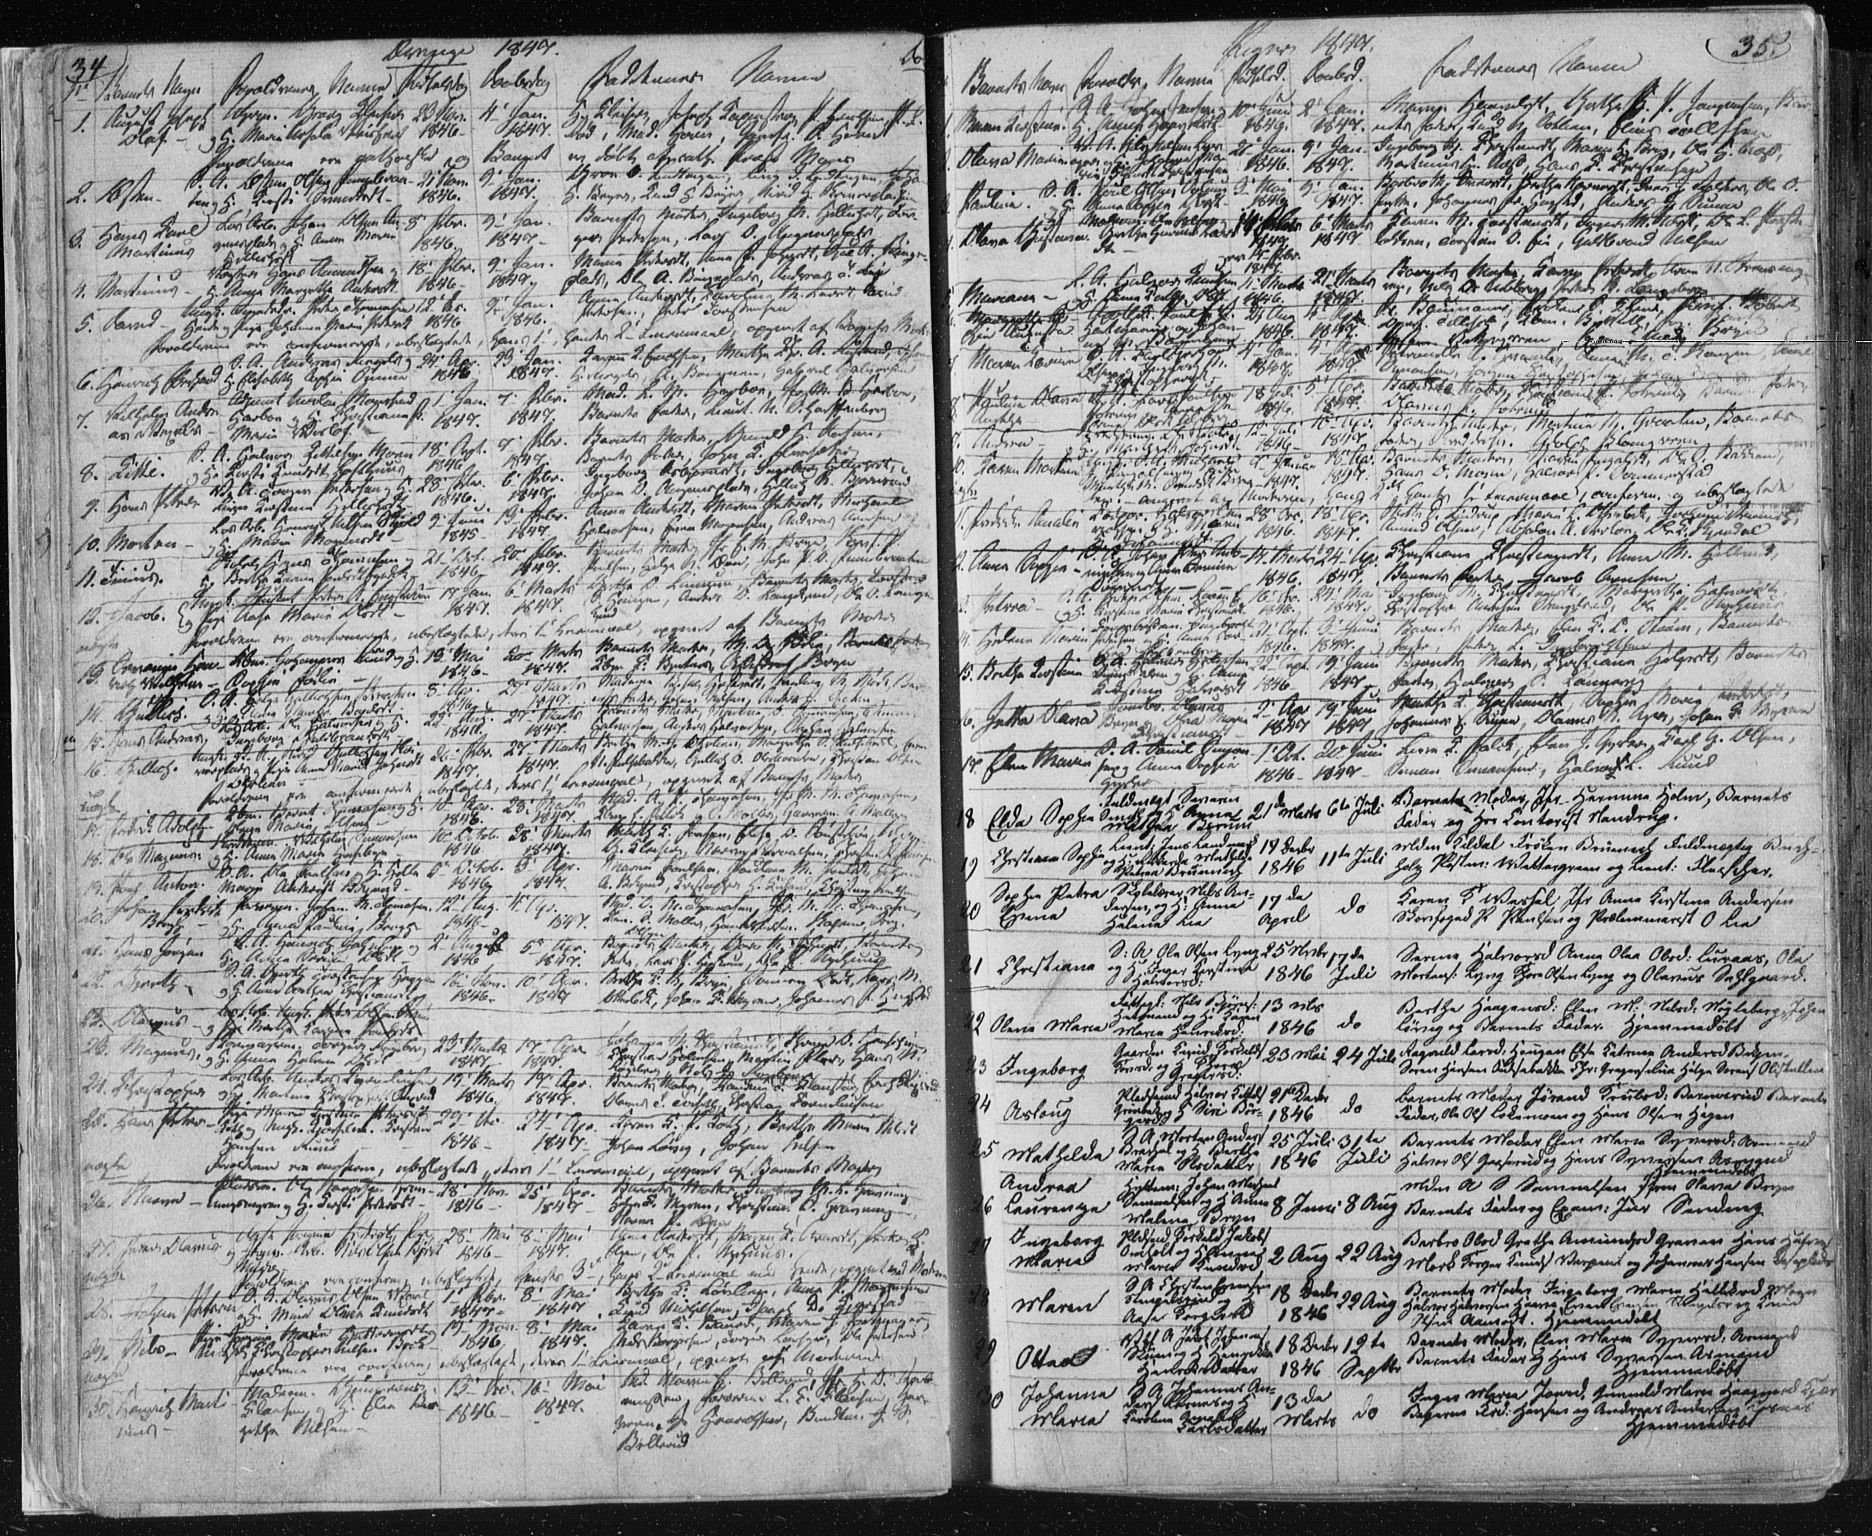 SAKO, Kongsberg kirkebøker, F/Fa/L0009: Parish register (official) no. I 9, 1839-1858, p. 34-35